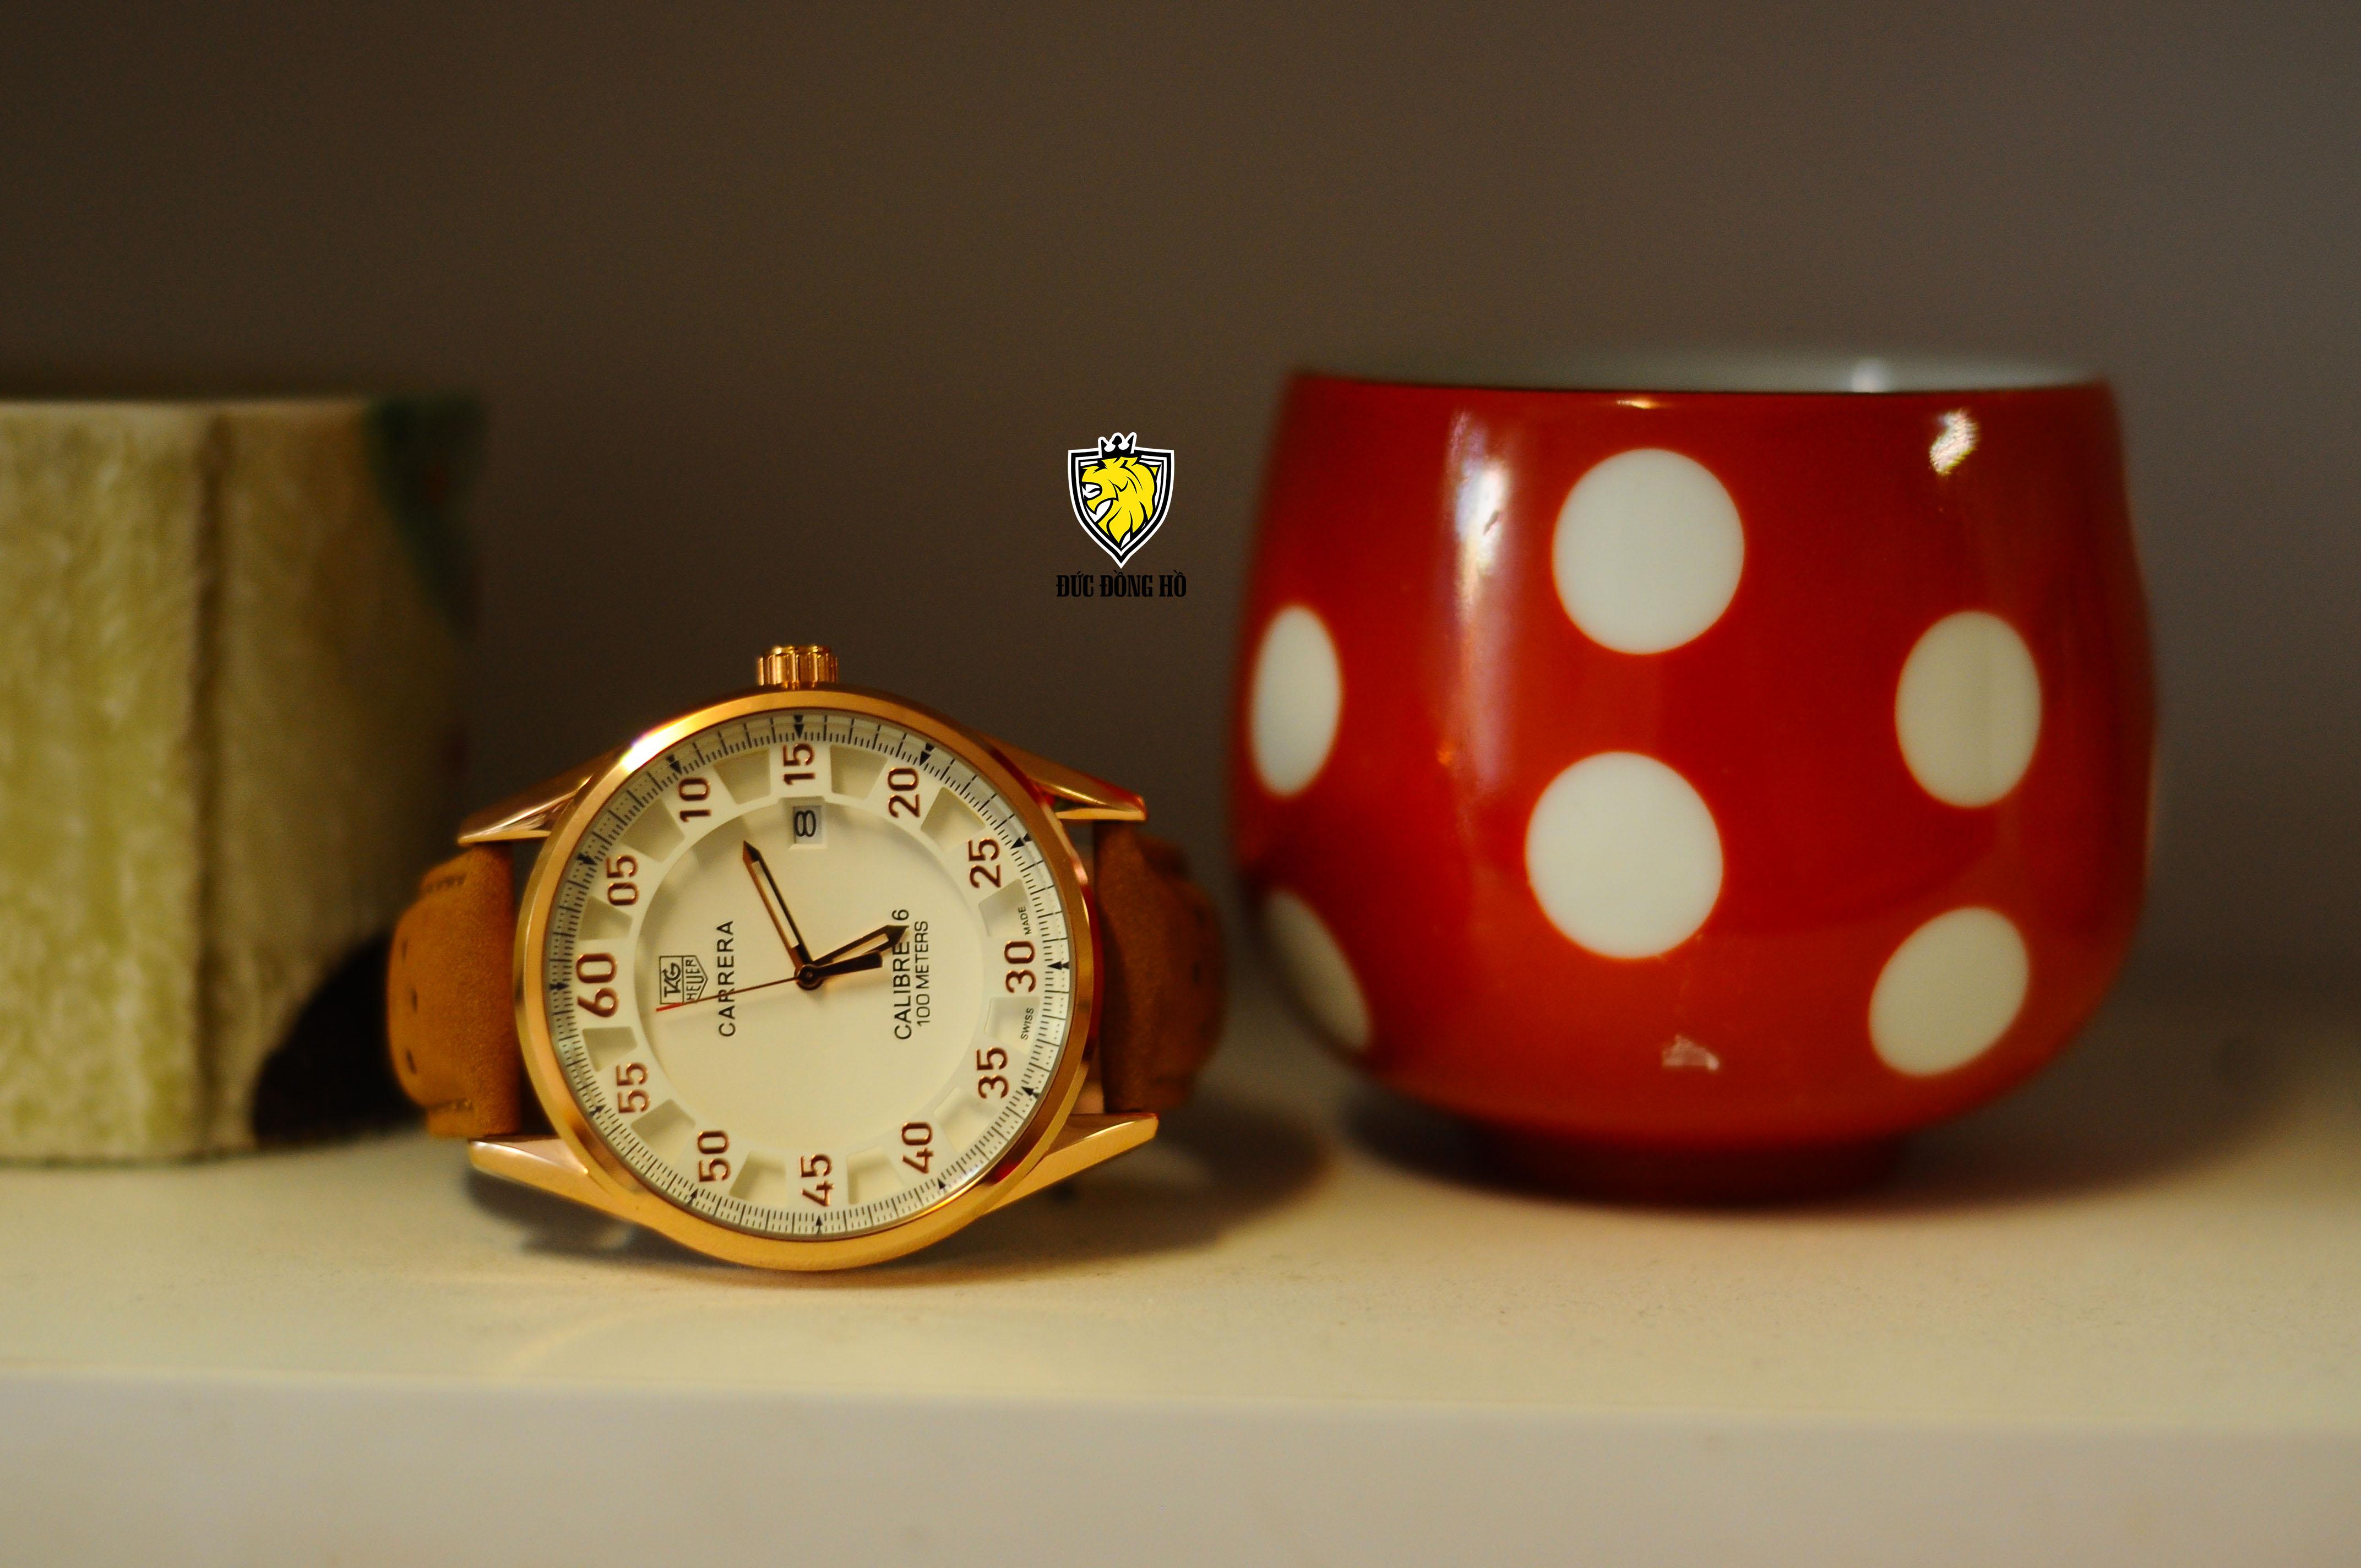 Đồng hồ Tag Heuer Nam 002.1